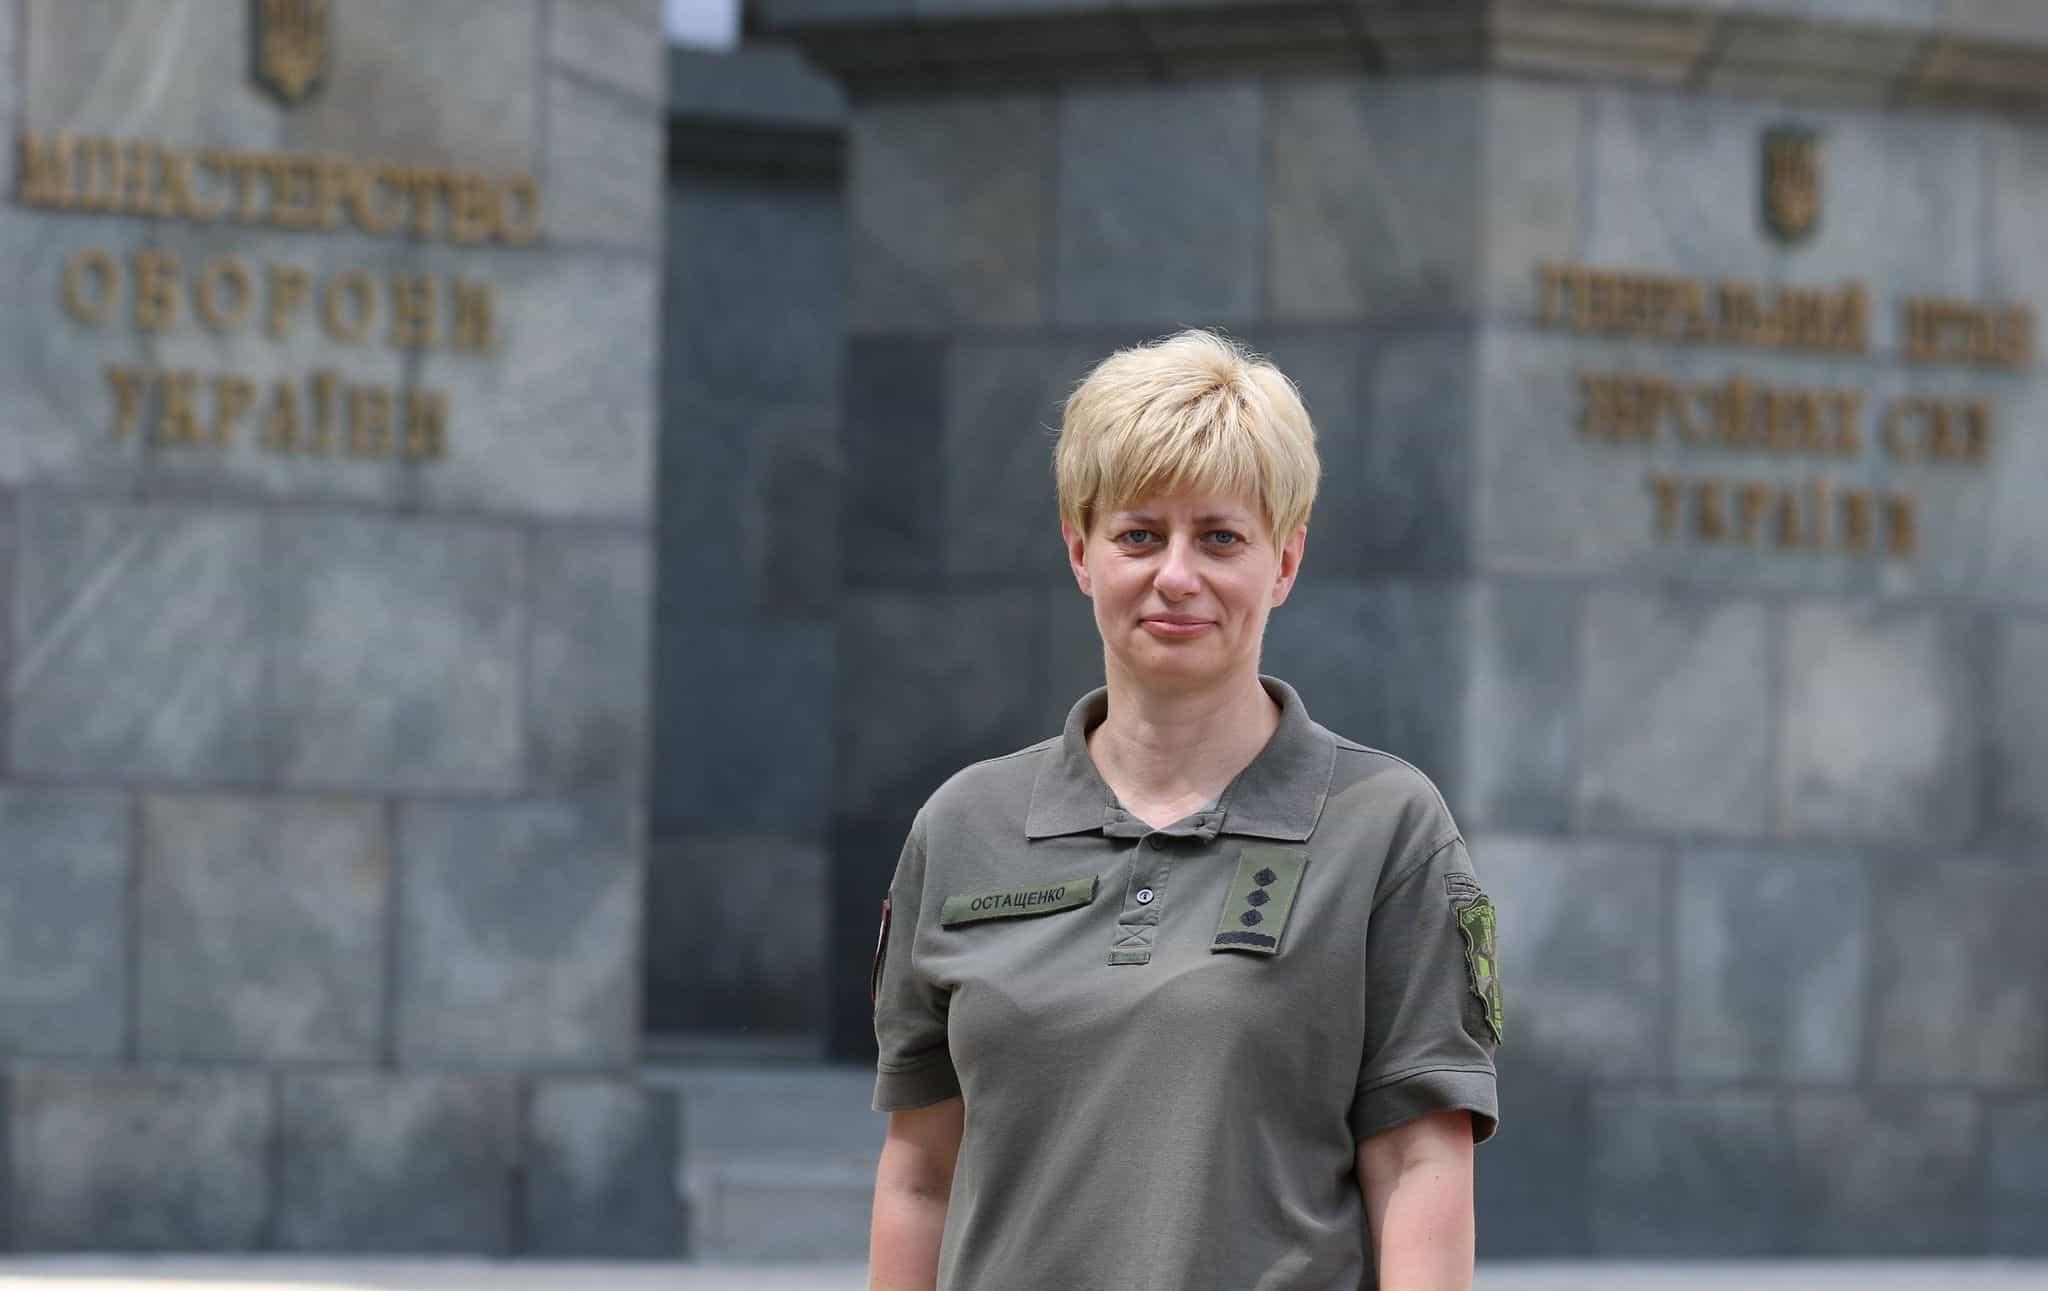 Полковника медичної служби Тетяна Остащенко